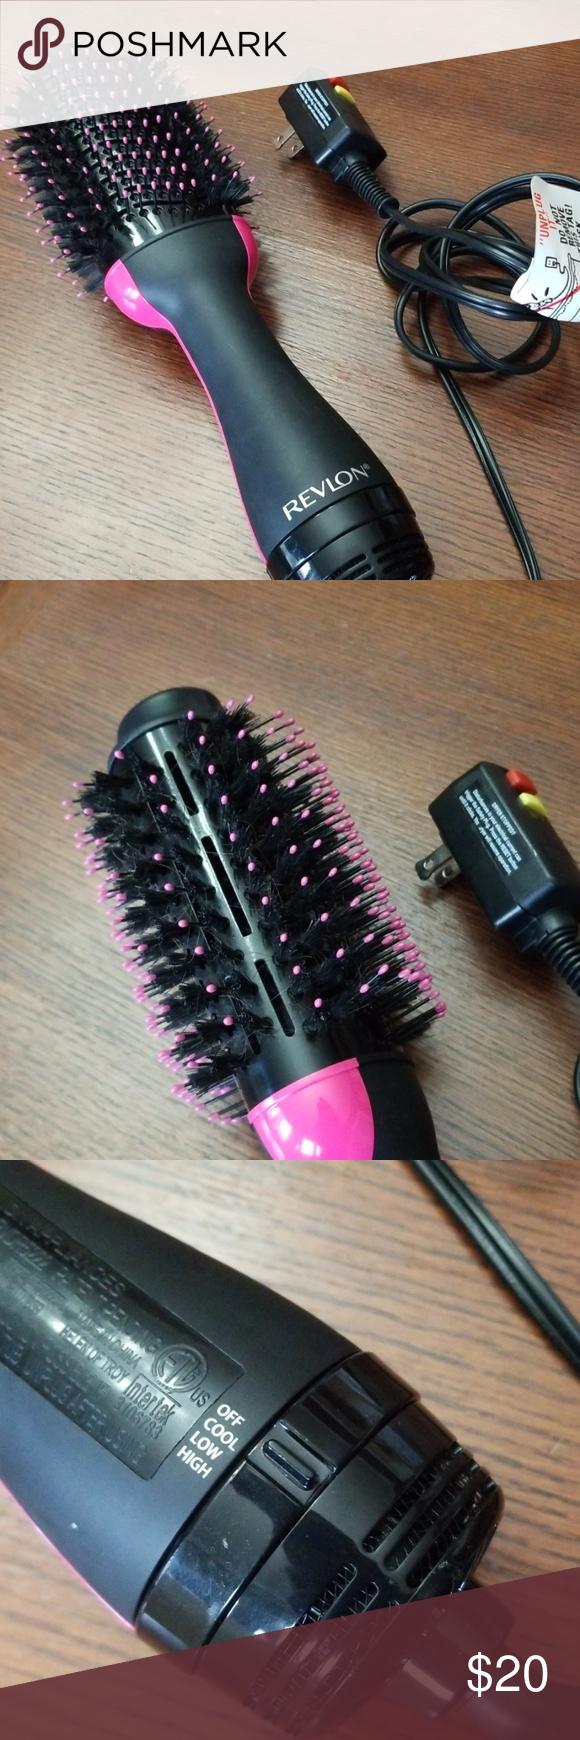 Revlon One Step Hair Dryer Voluminzer Brush Nwot Revlon One Step Hair Dryer Voluminzer Hot Air Brush Unique Oval Design Cool Tip Tangle In 2020 Revlon Black Pink